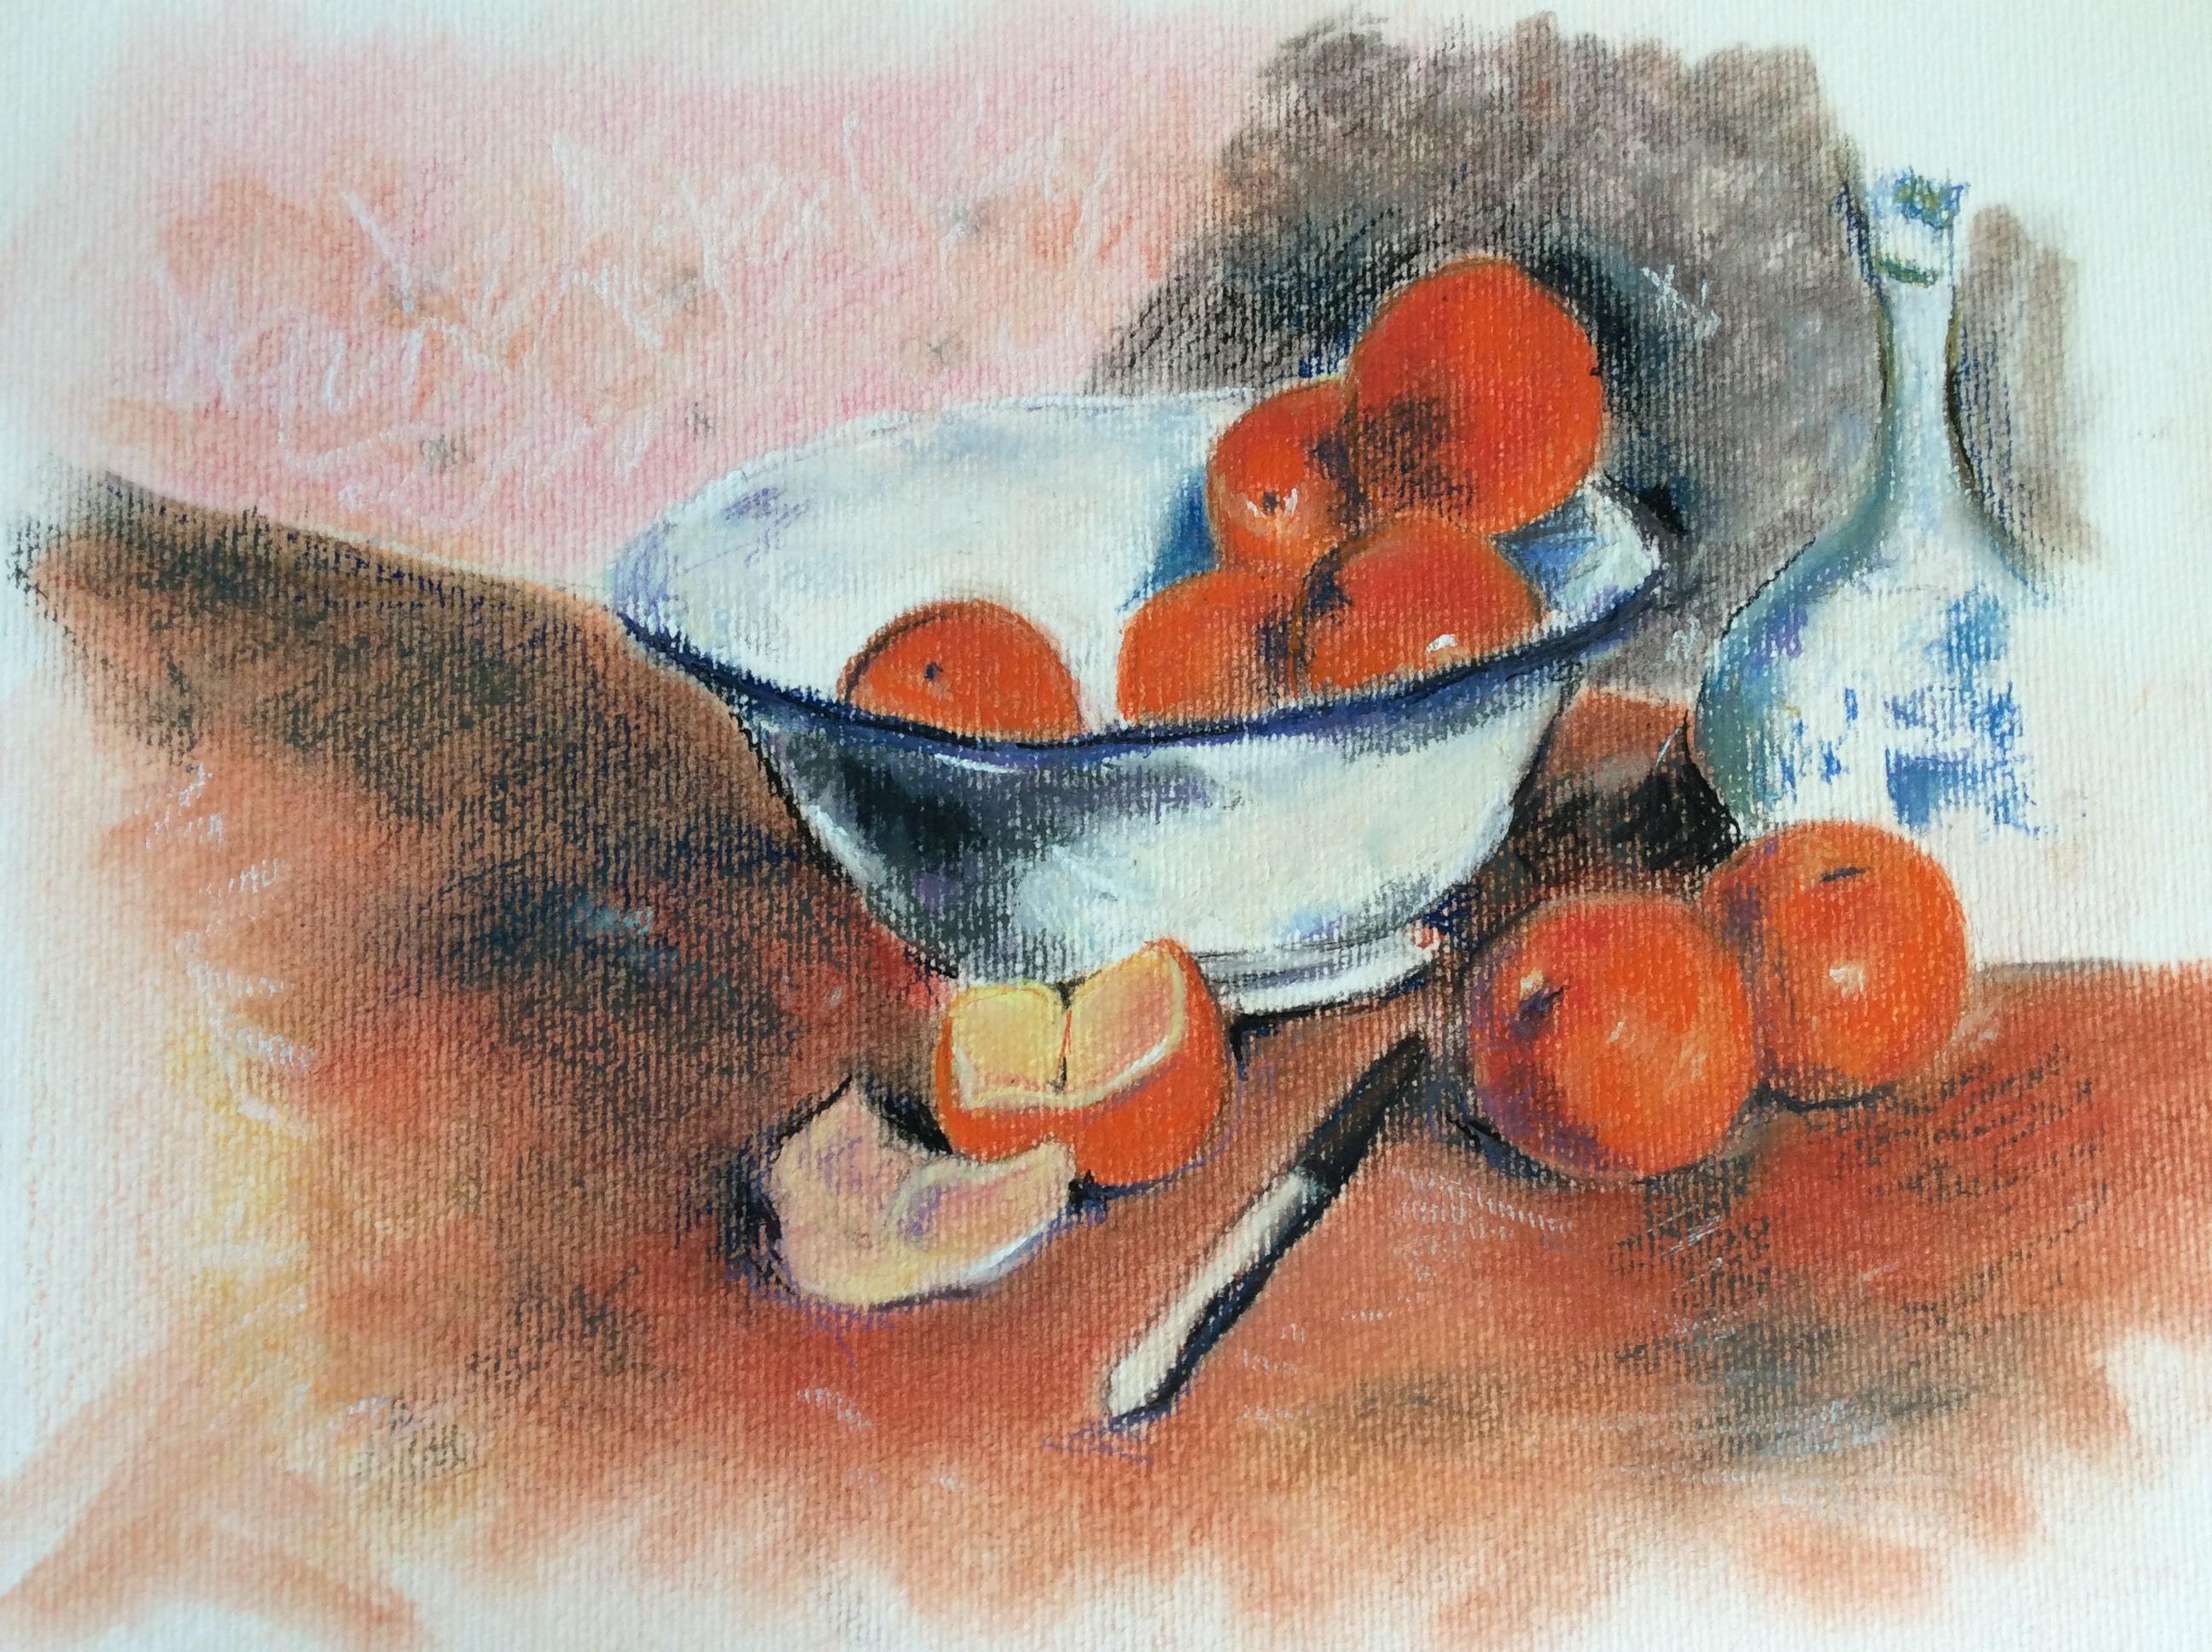 copie- Oranges de Gauguin- 30X40 - 160 €